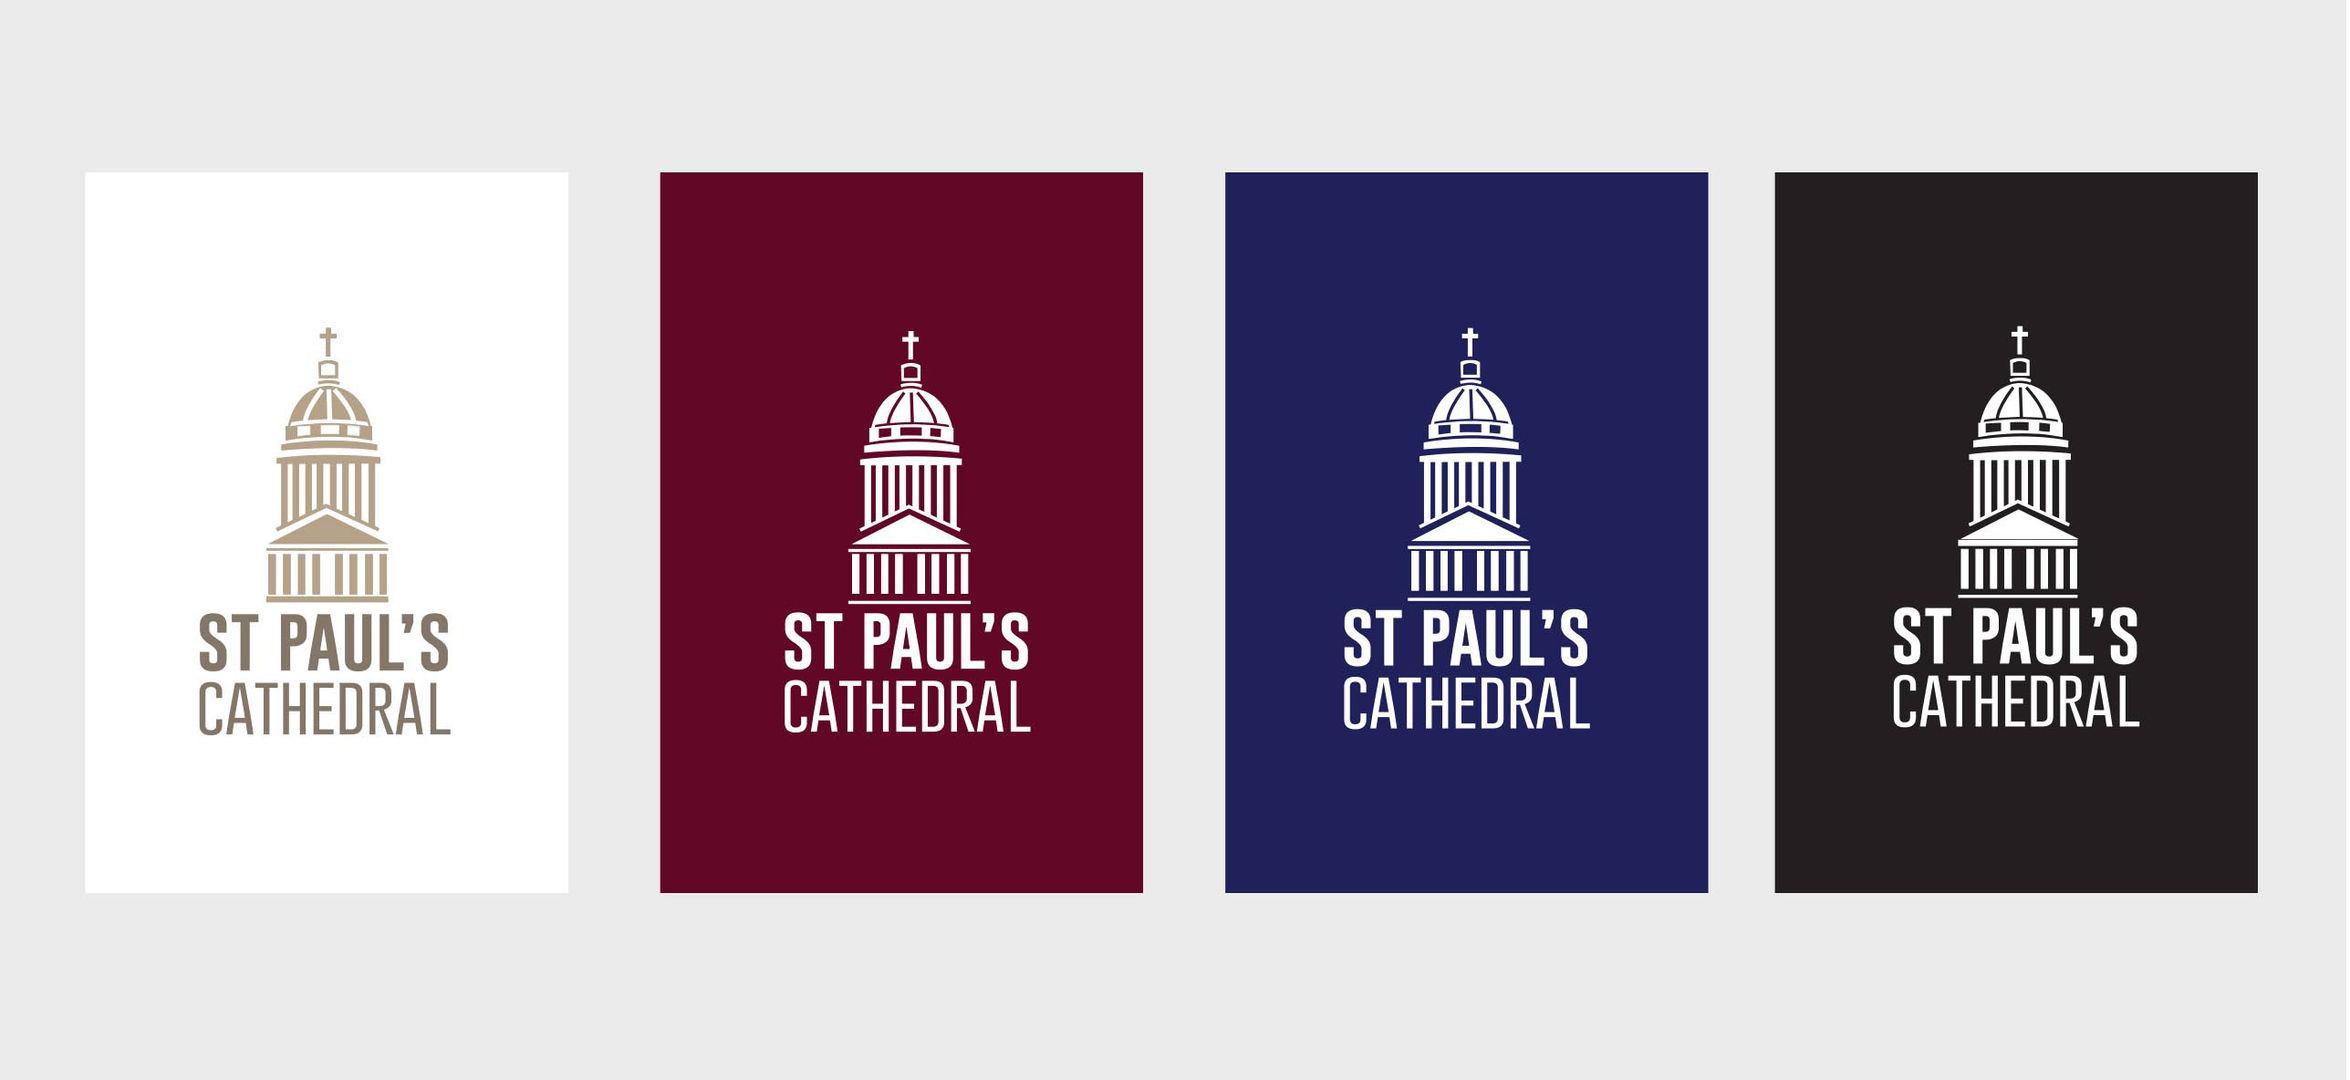 St-Pauls-Cathedral-logo.jpg